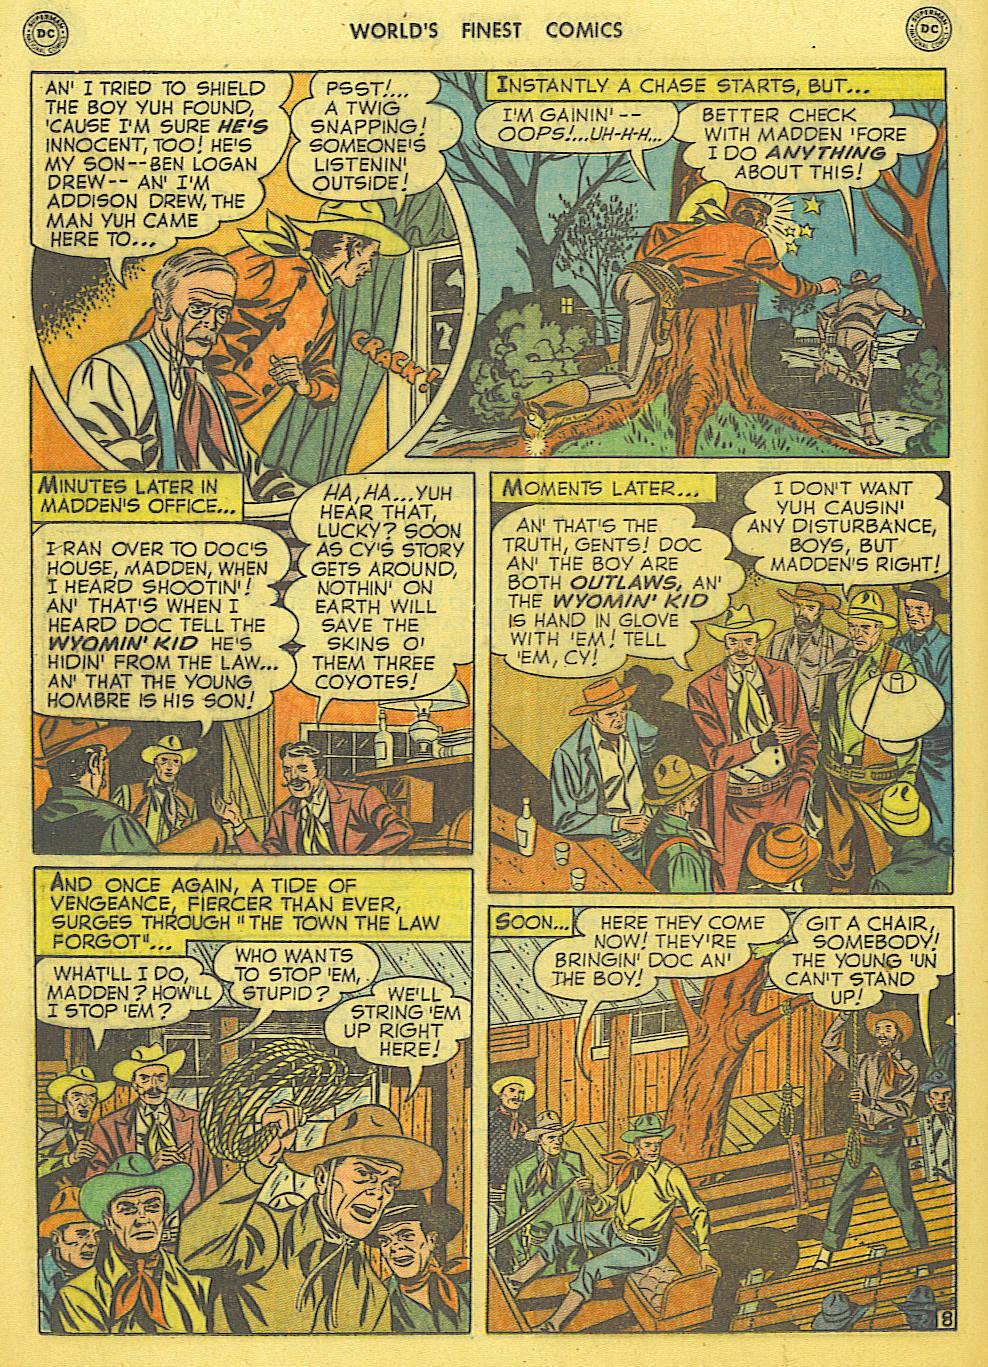 Read online World's Finest Comics comic -  Issue #49 - 47